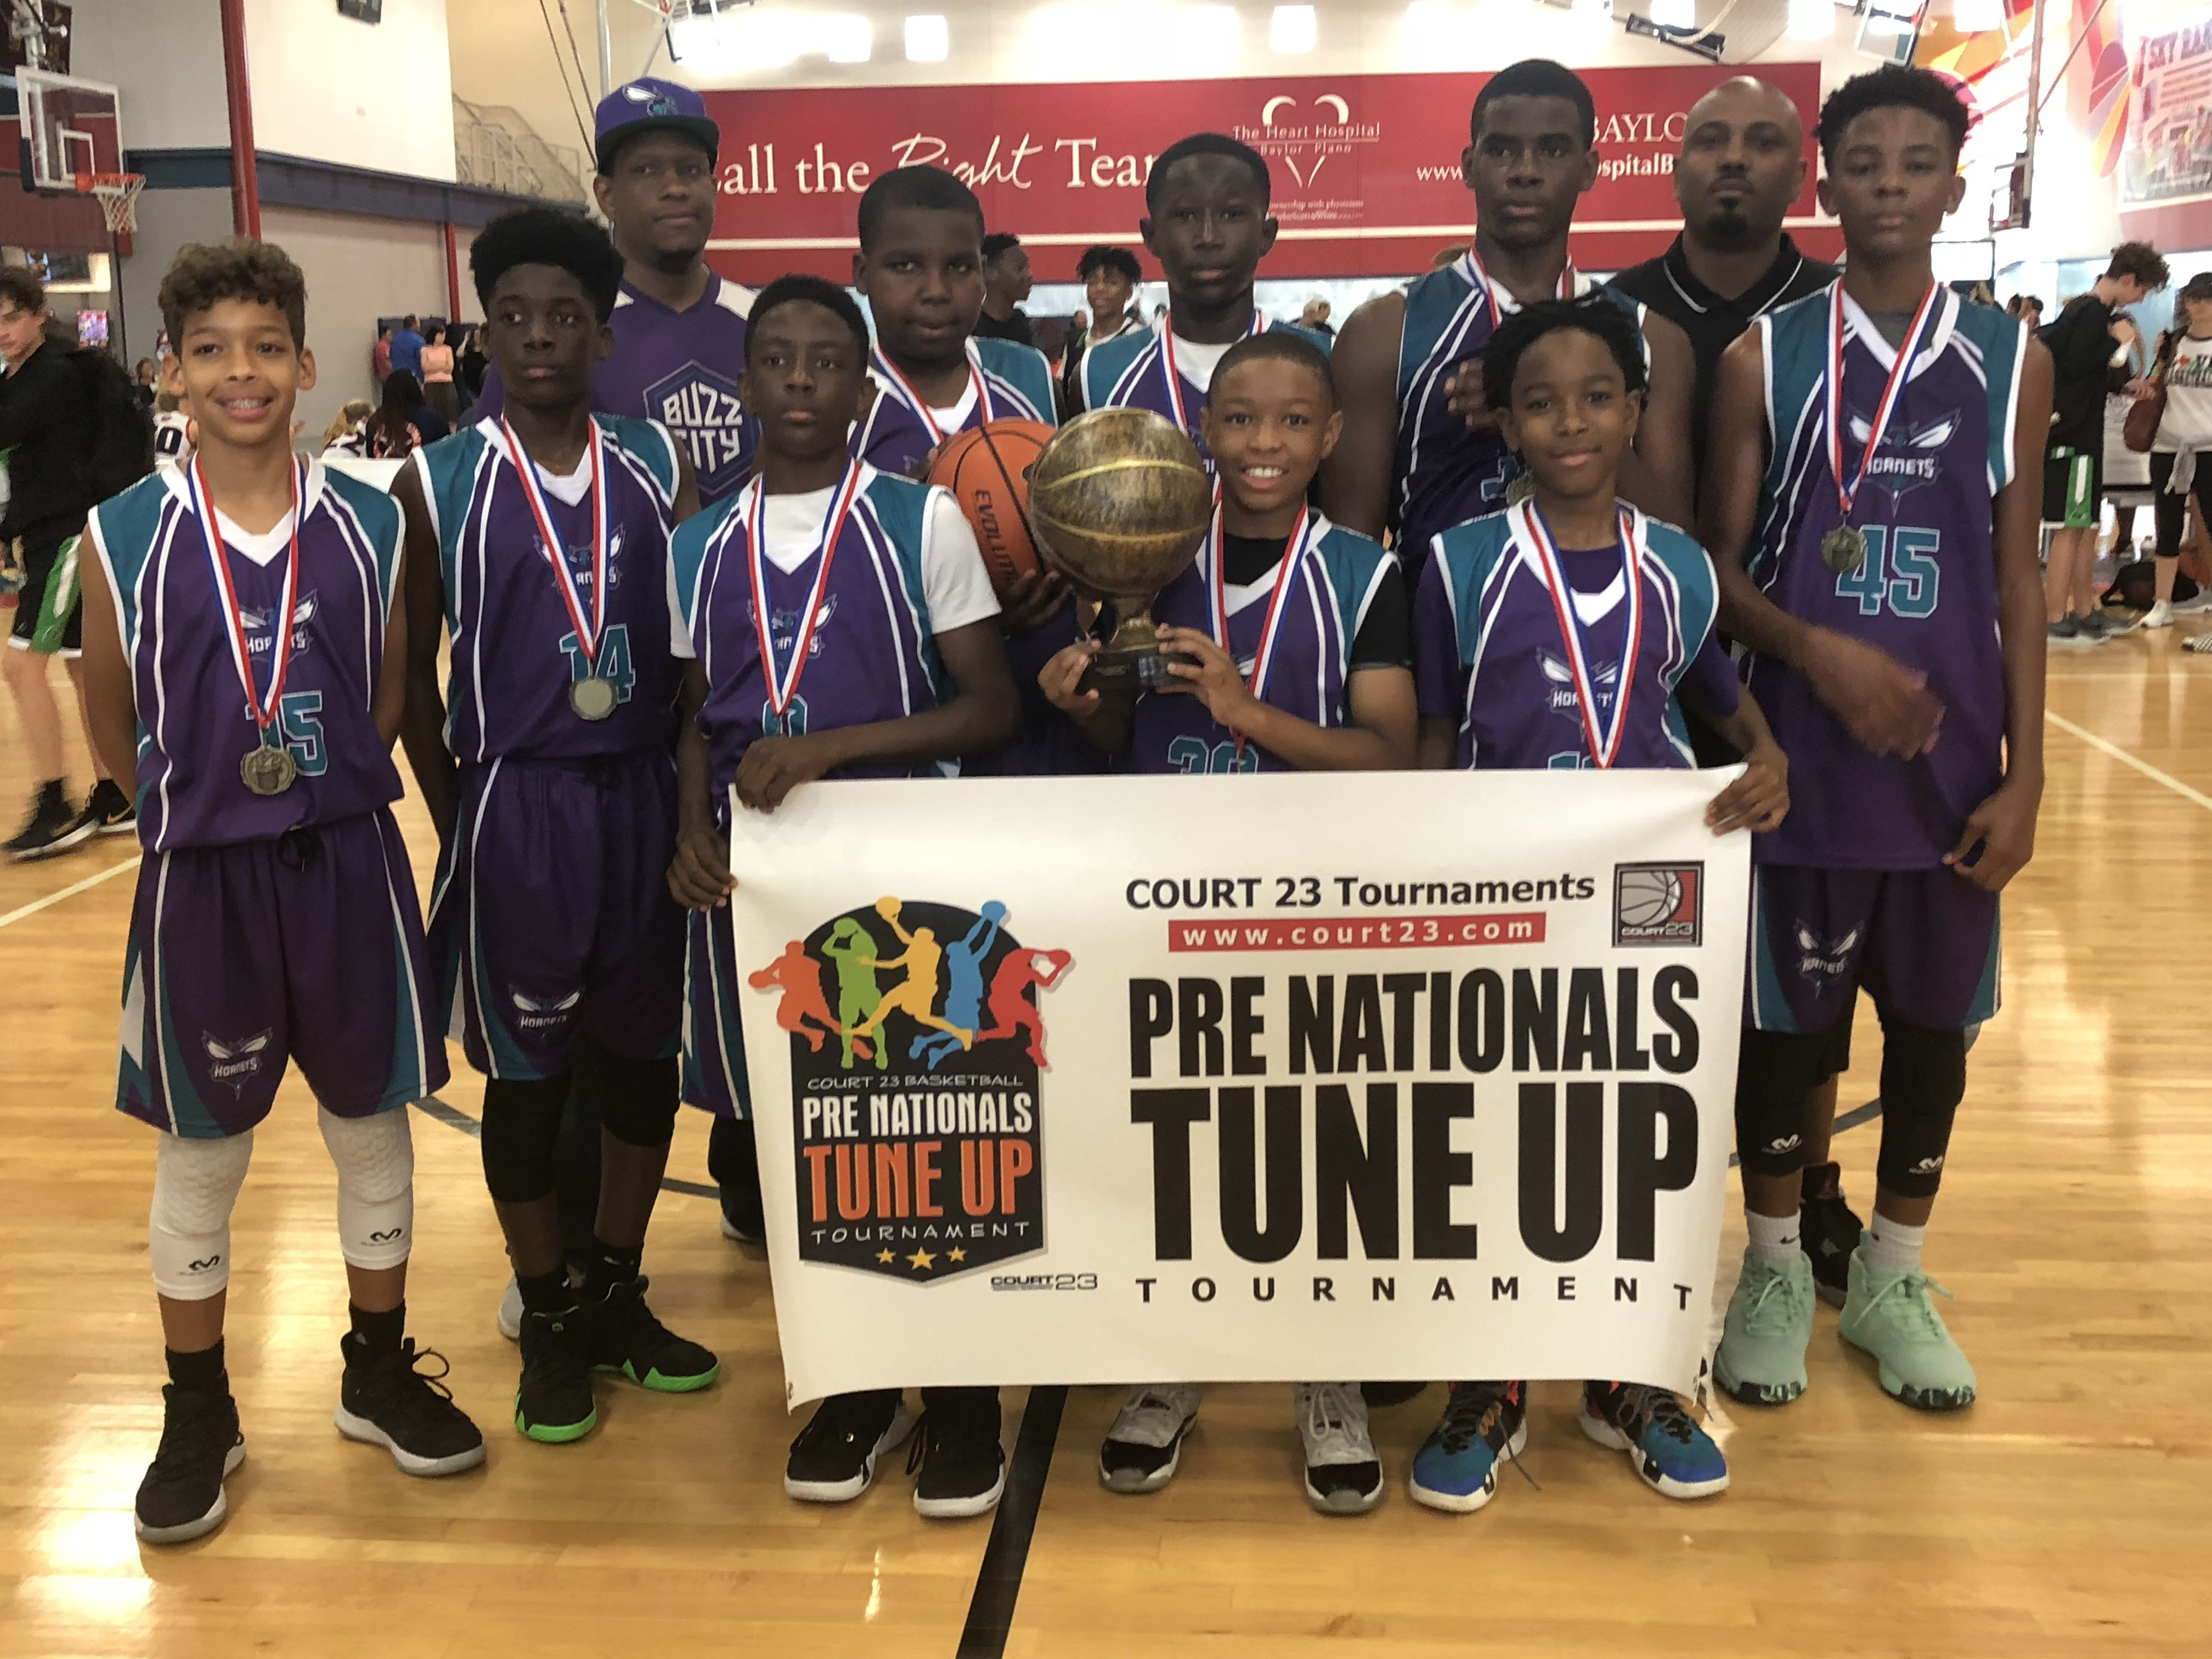 Court 23 Tournaments Elite Youth Basketball Tournaments Pre Nationals Tune Up Youth Basketball Tournaments Basketball Tournament